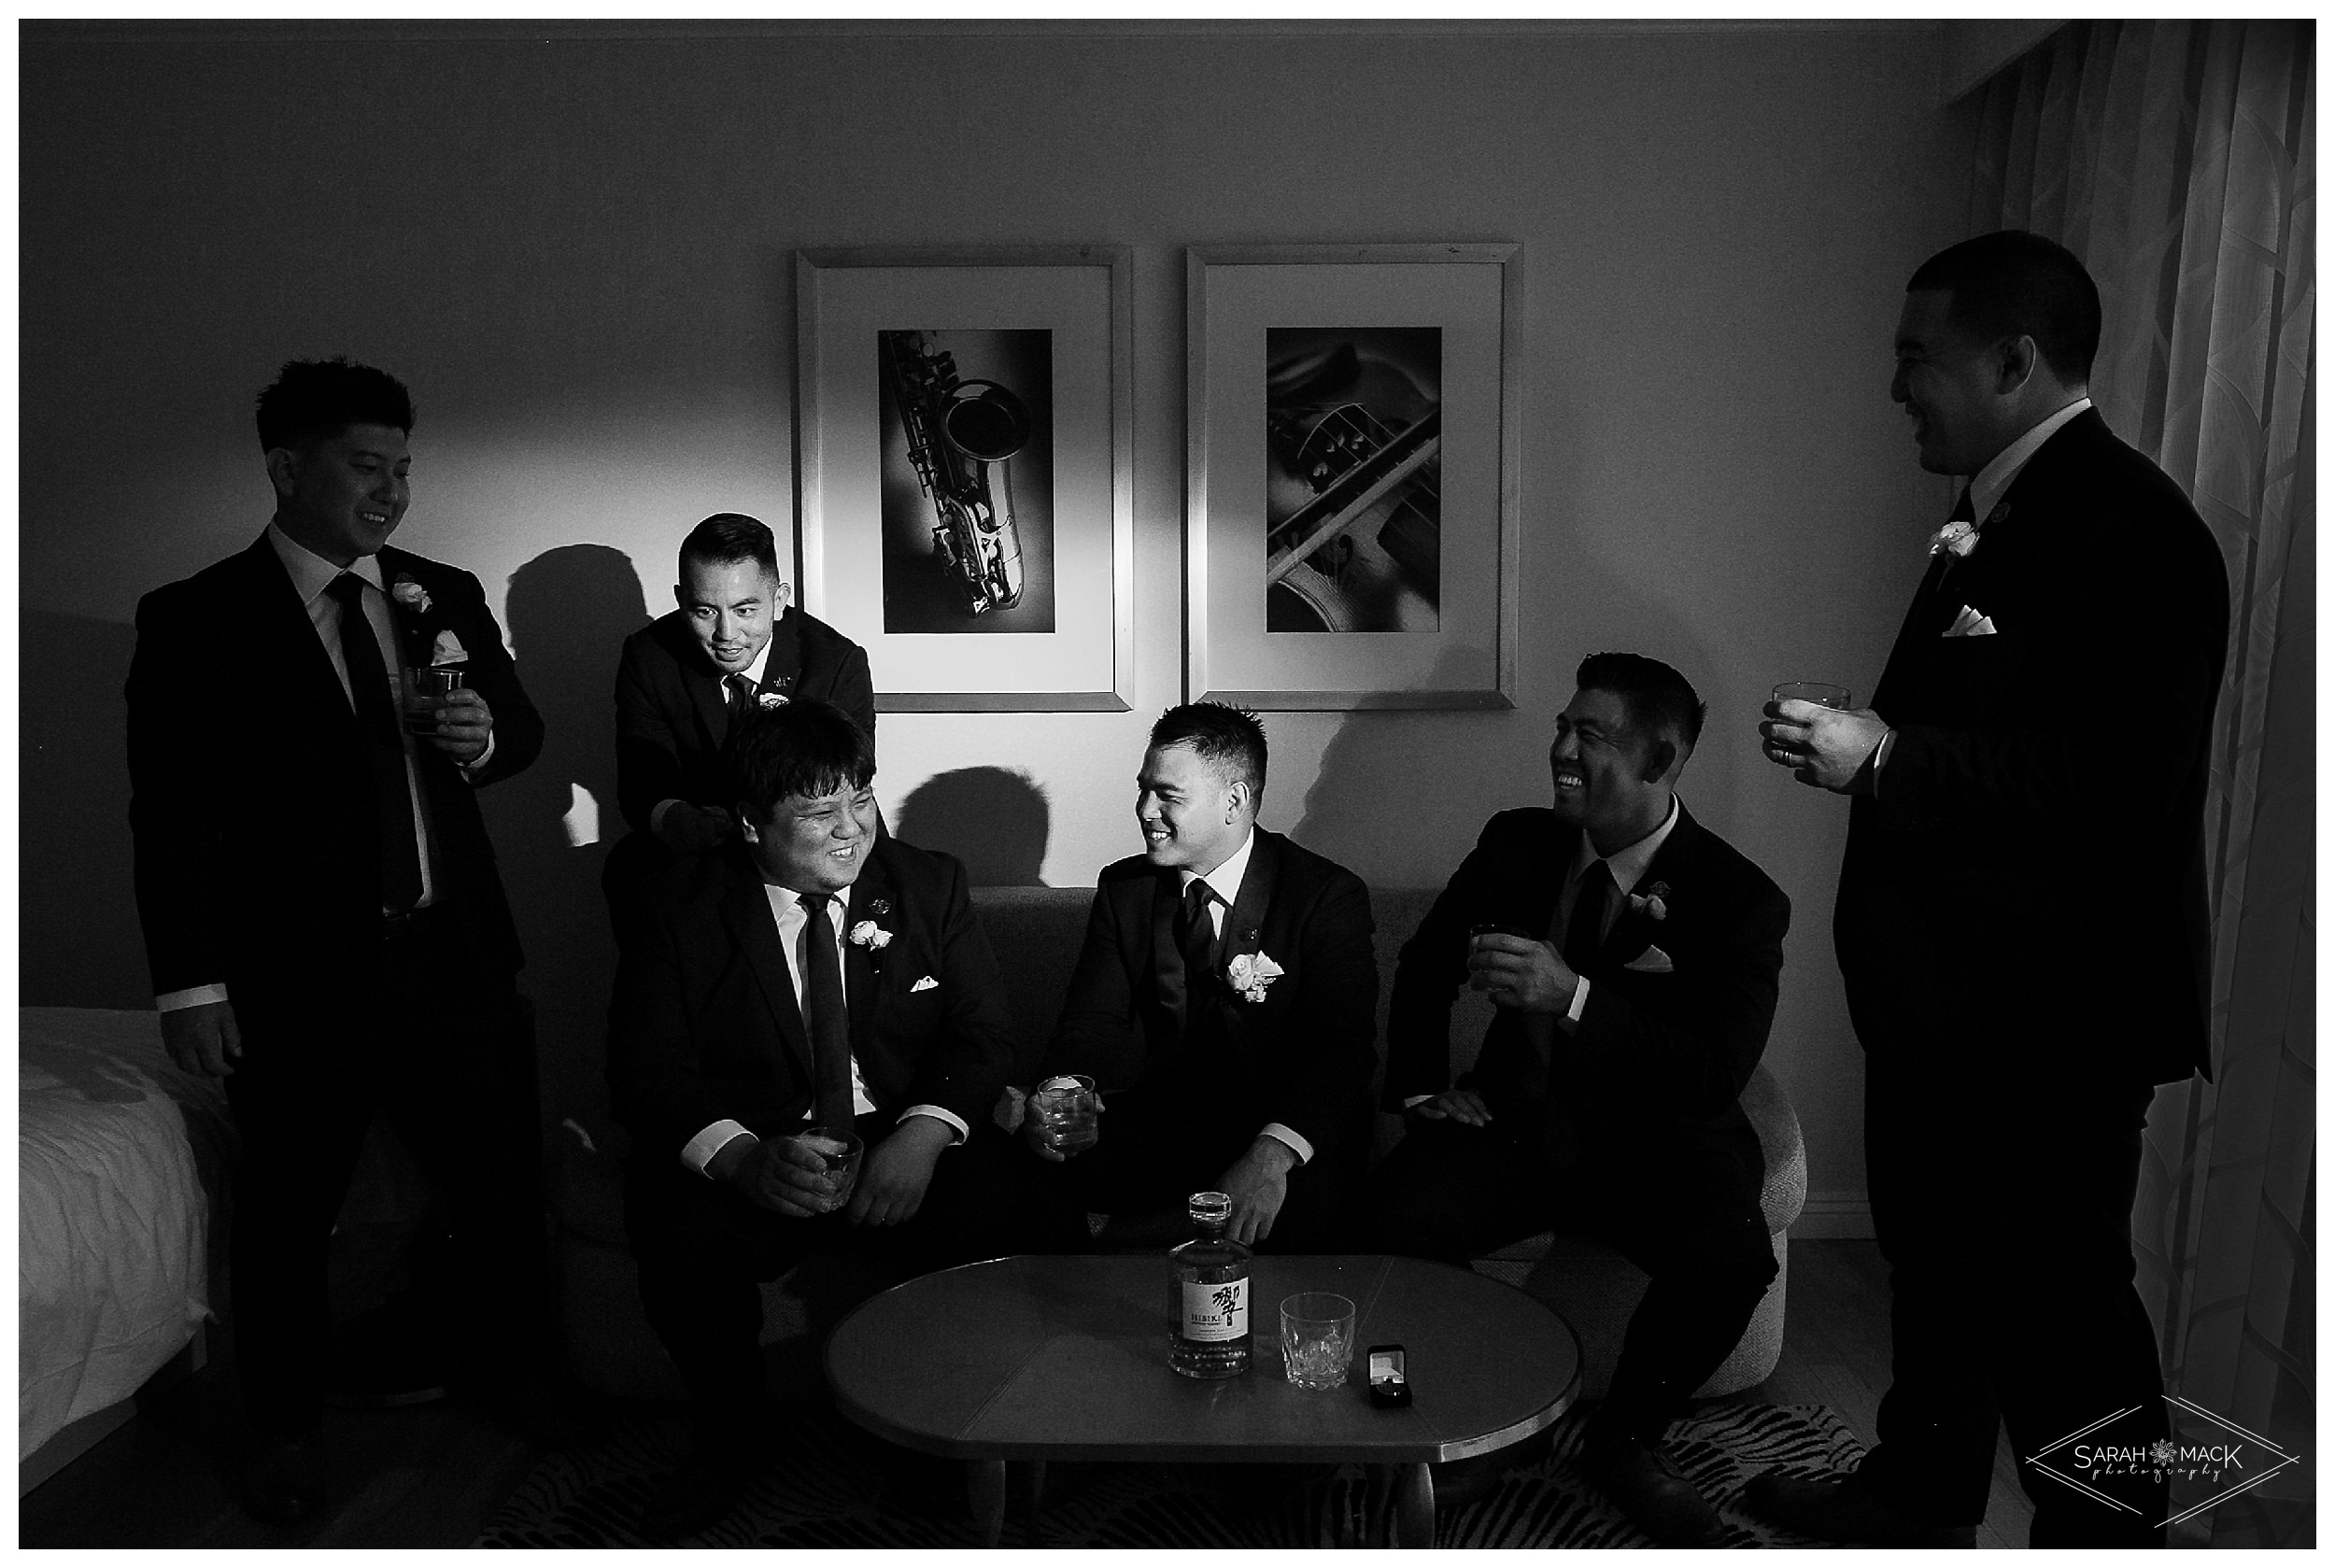 LE-Avenue-of-the-Arts-Costa-Mesa-Wedding-Photography-0038.jpg